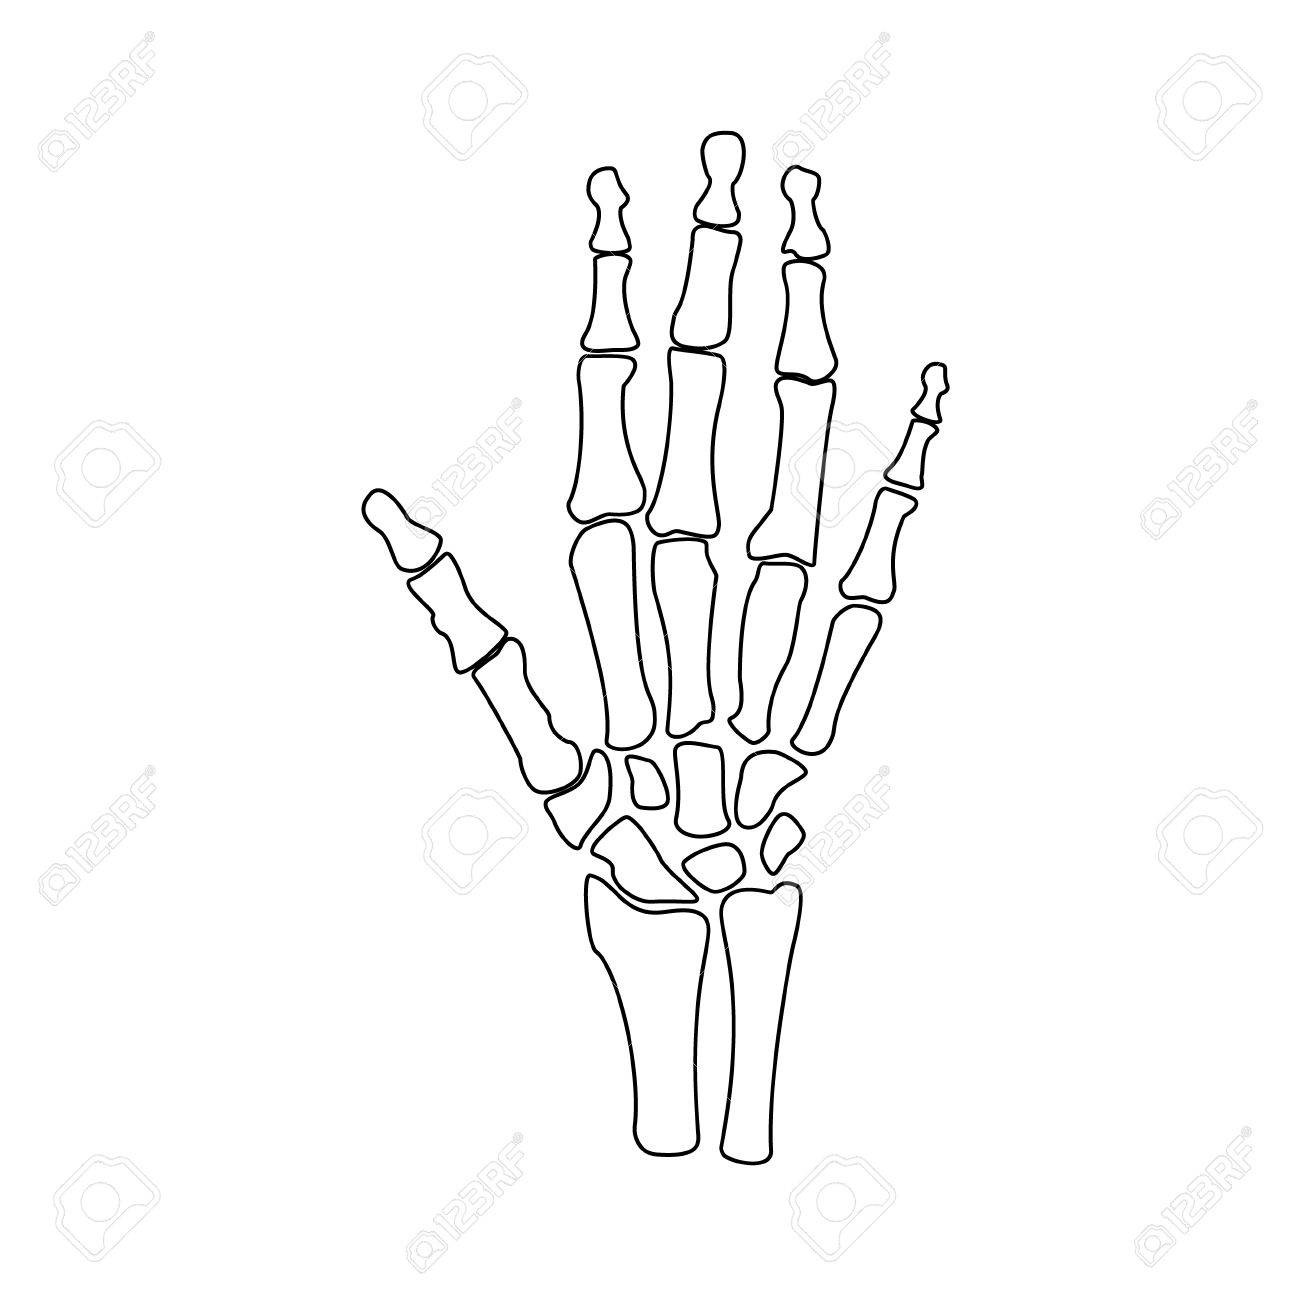 Raster Illustration Hand Bones Outline Drawing Orthopedic Human